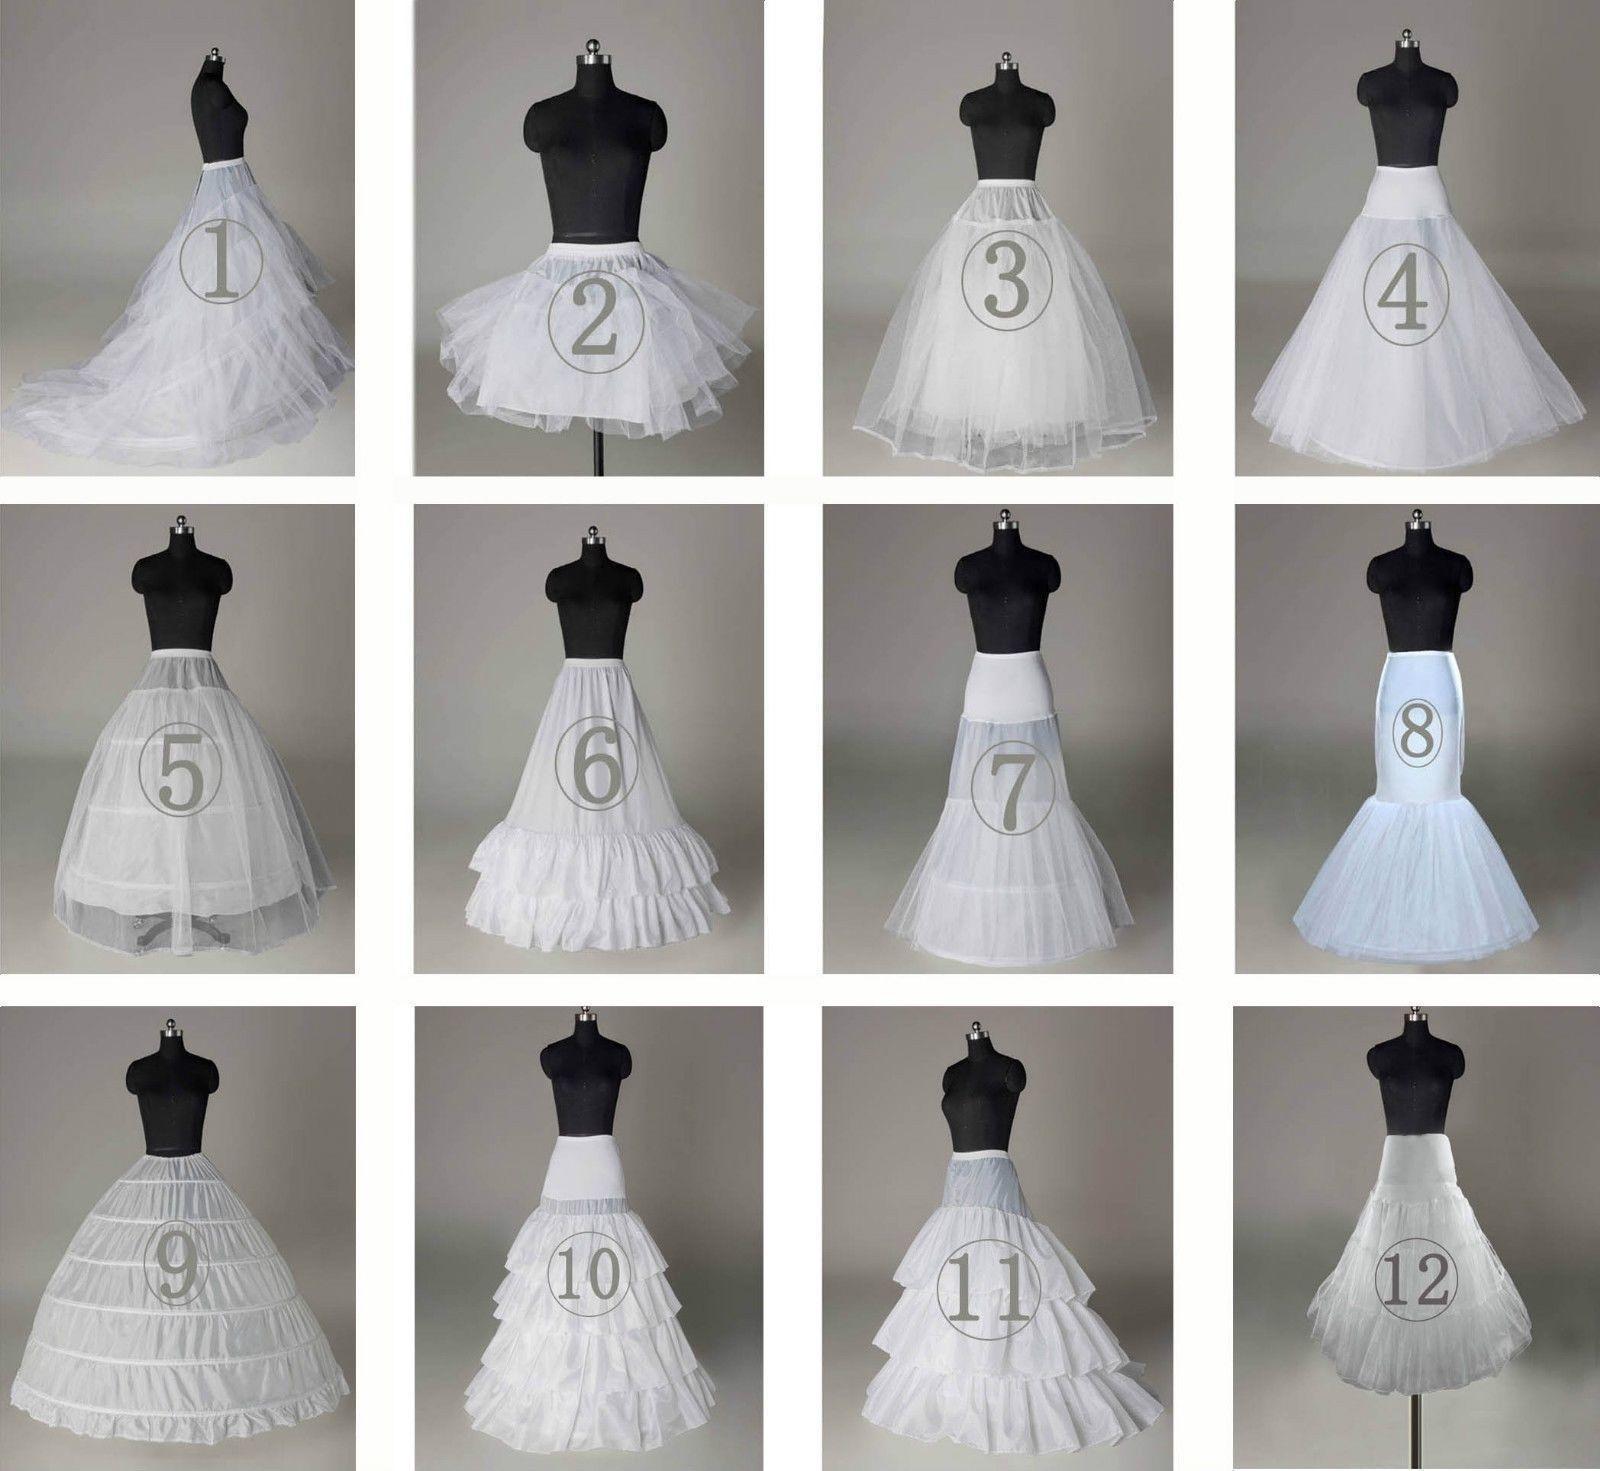 New White Net 3 6 Hoops Wedding Bridal Petticoat Underskirt Slips Crinoline In Petticoats From Wed Fancy Skirts Wedding Dress Petticoat Crinoline Wedding Dress